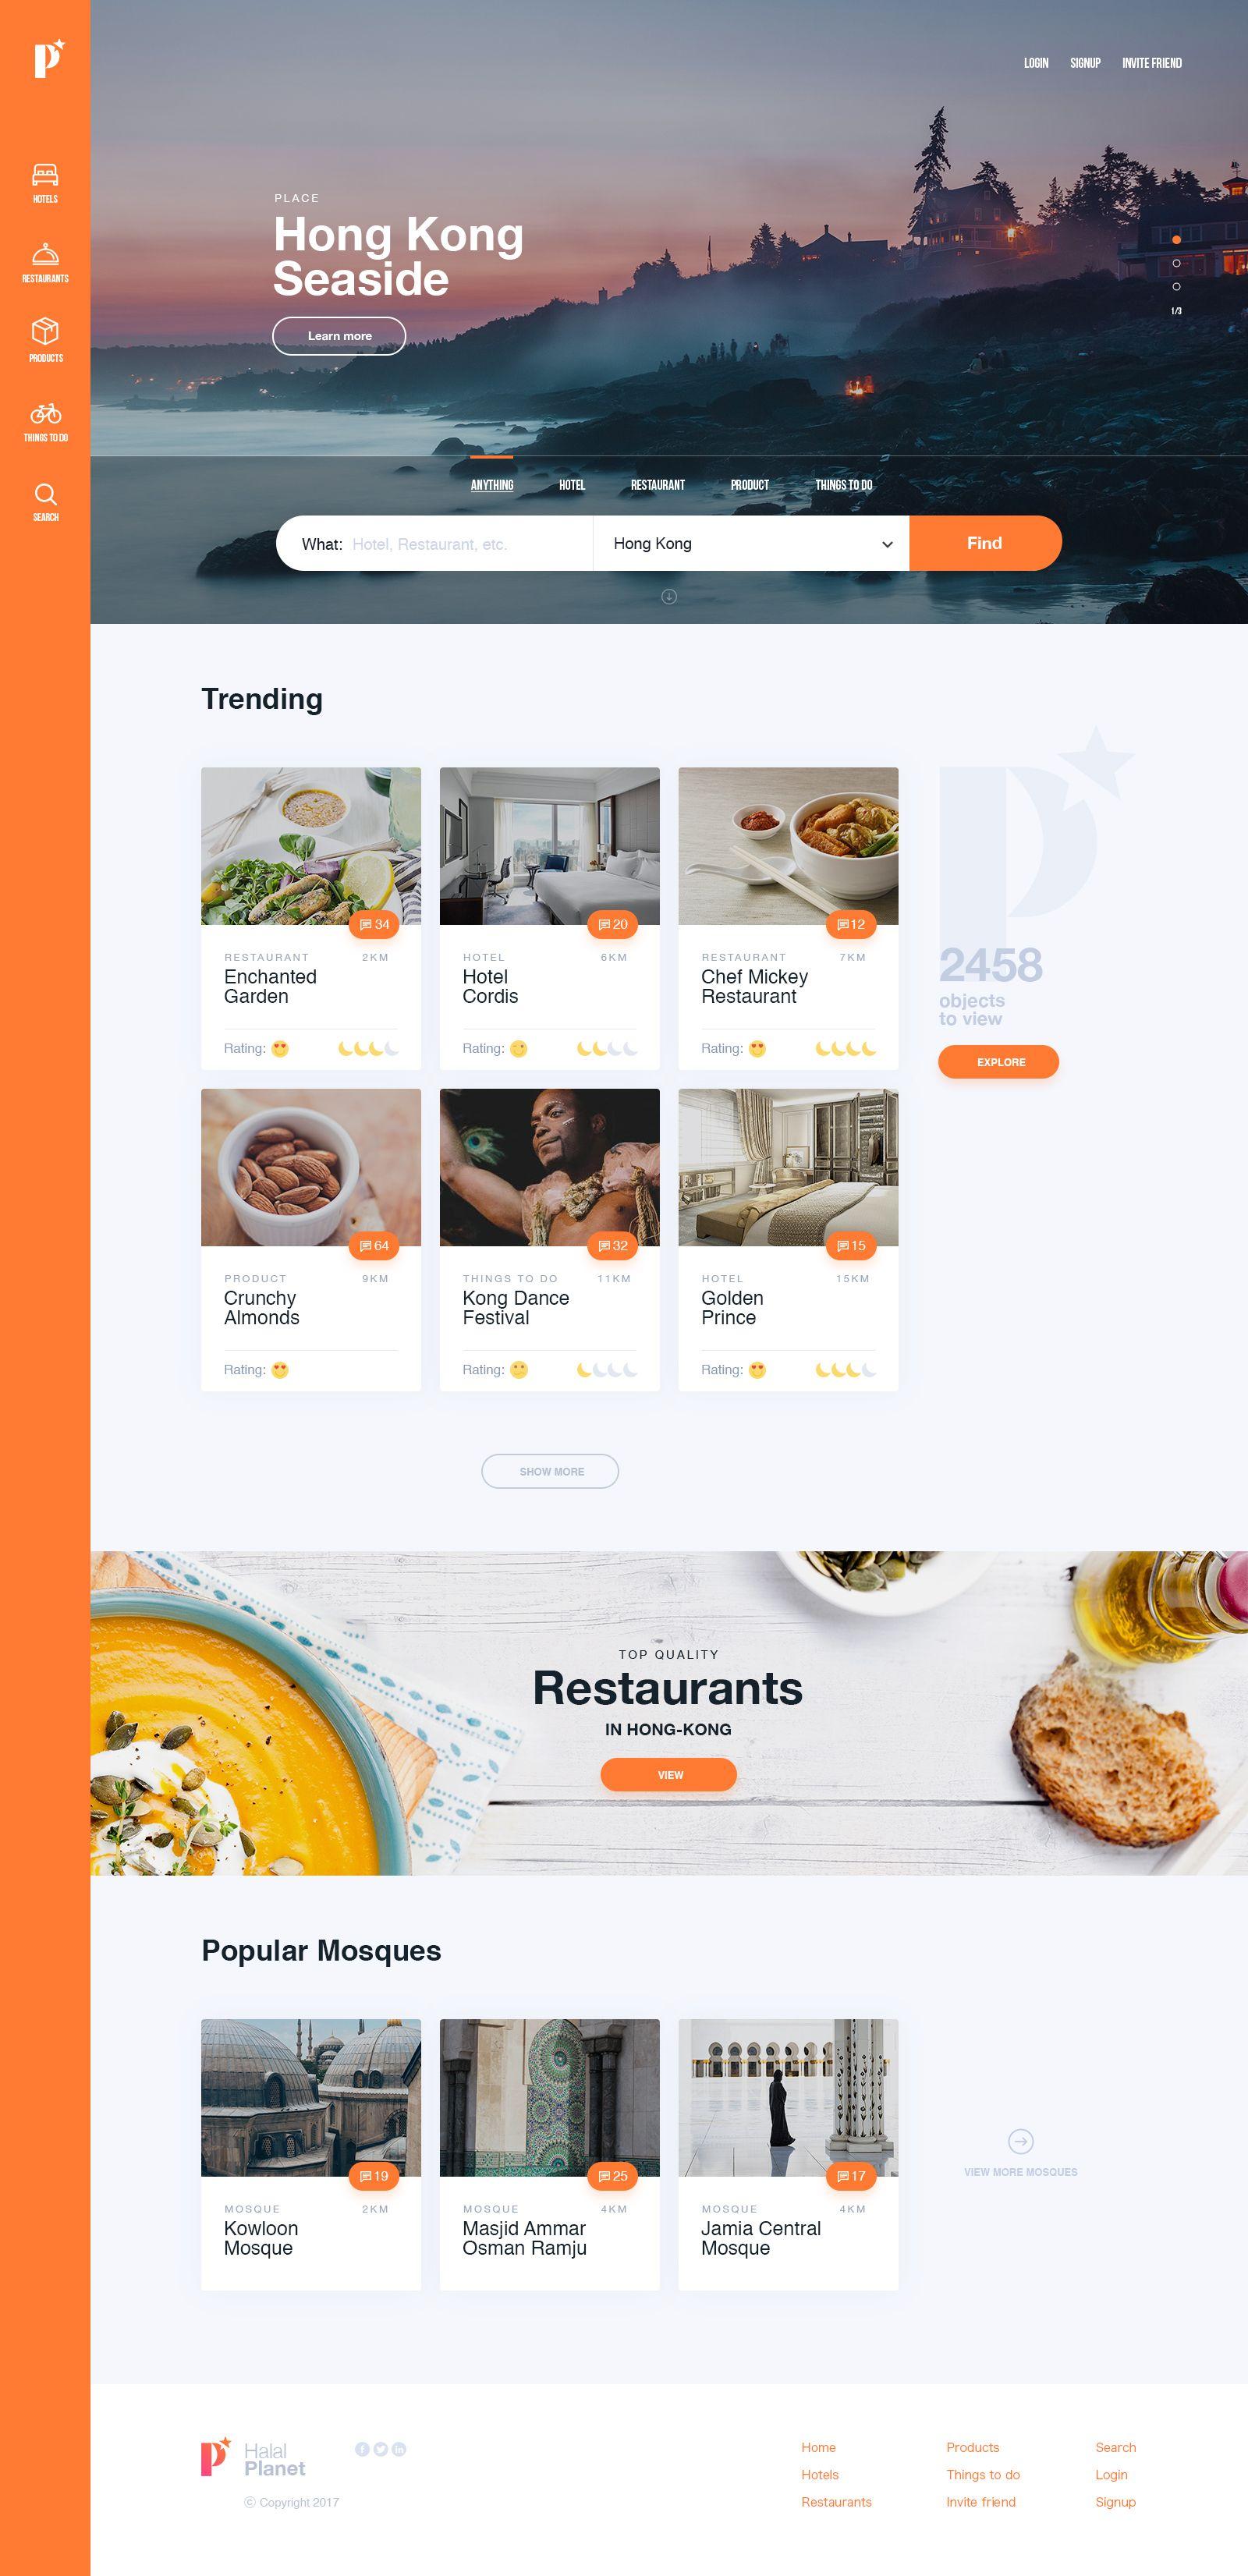 Home Web Design Layout Userinterface Website Repinned By Alexander Kaiser Visit Www Kaiser Al Web Layout Design Web Design Tips Web Development Design